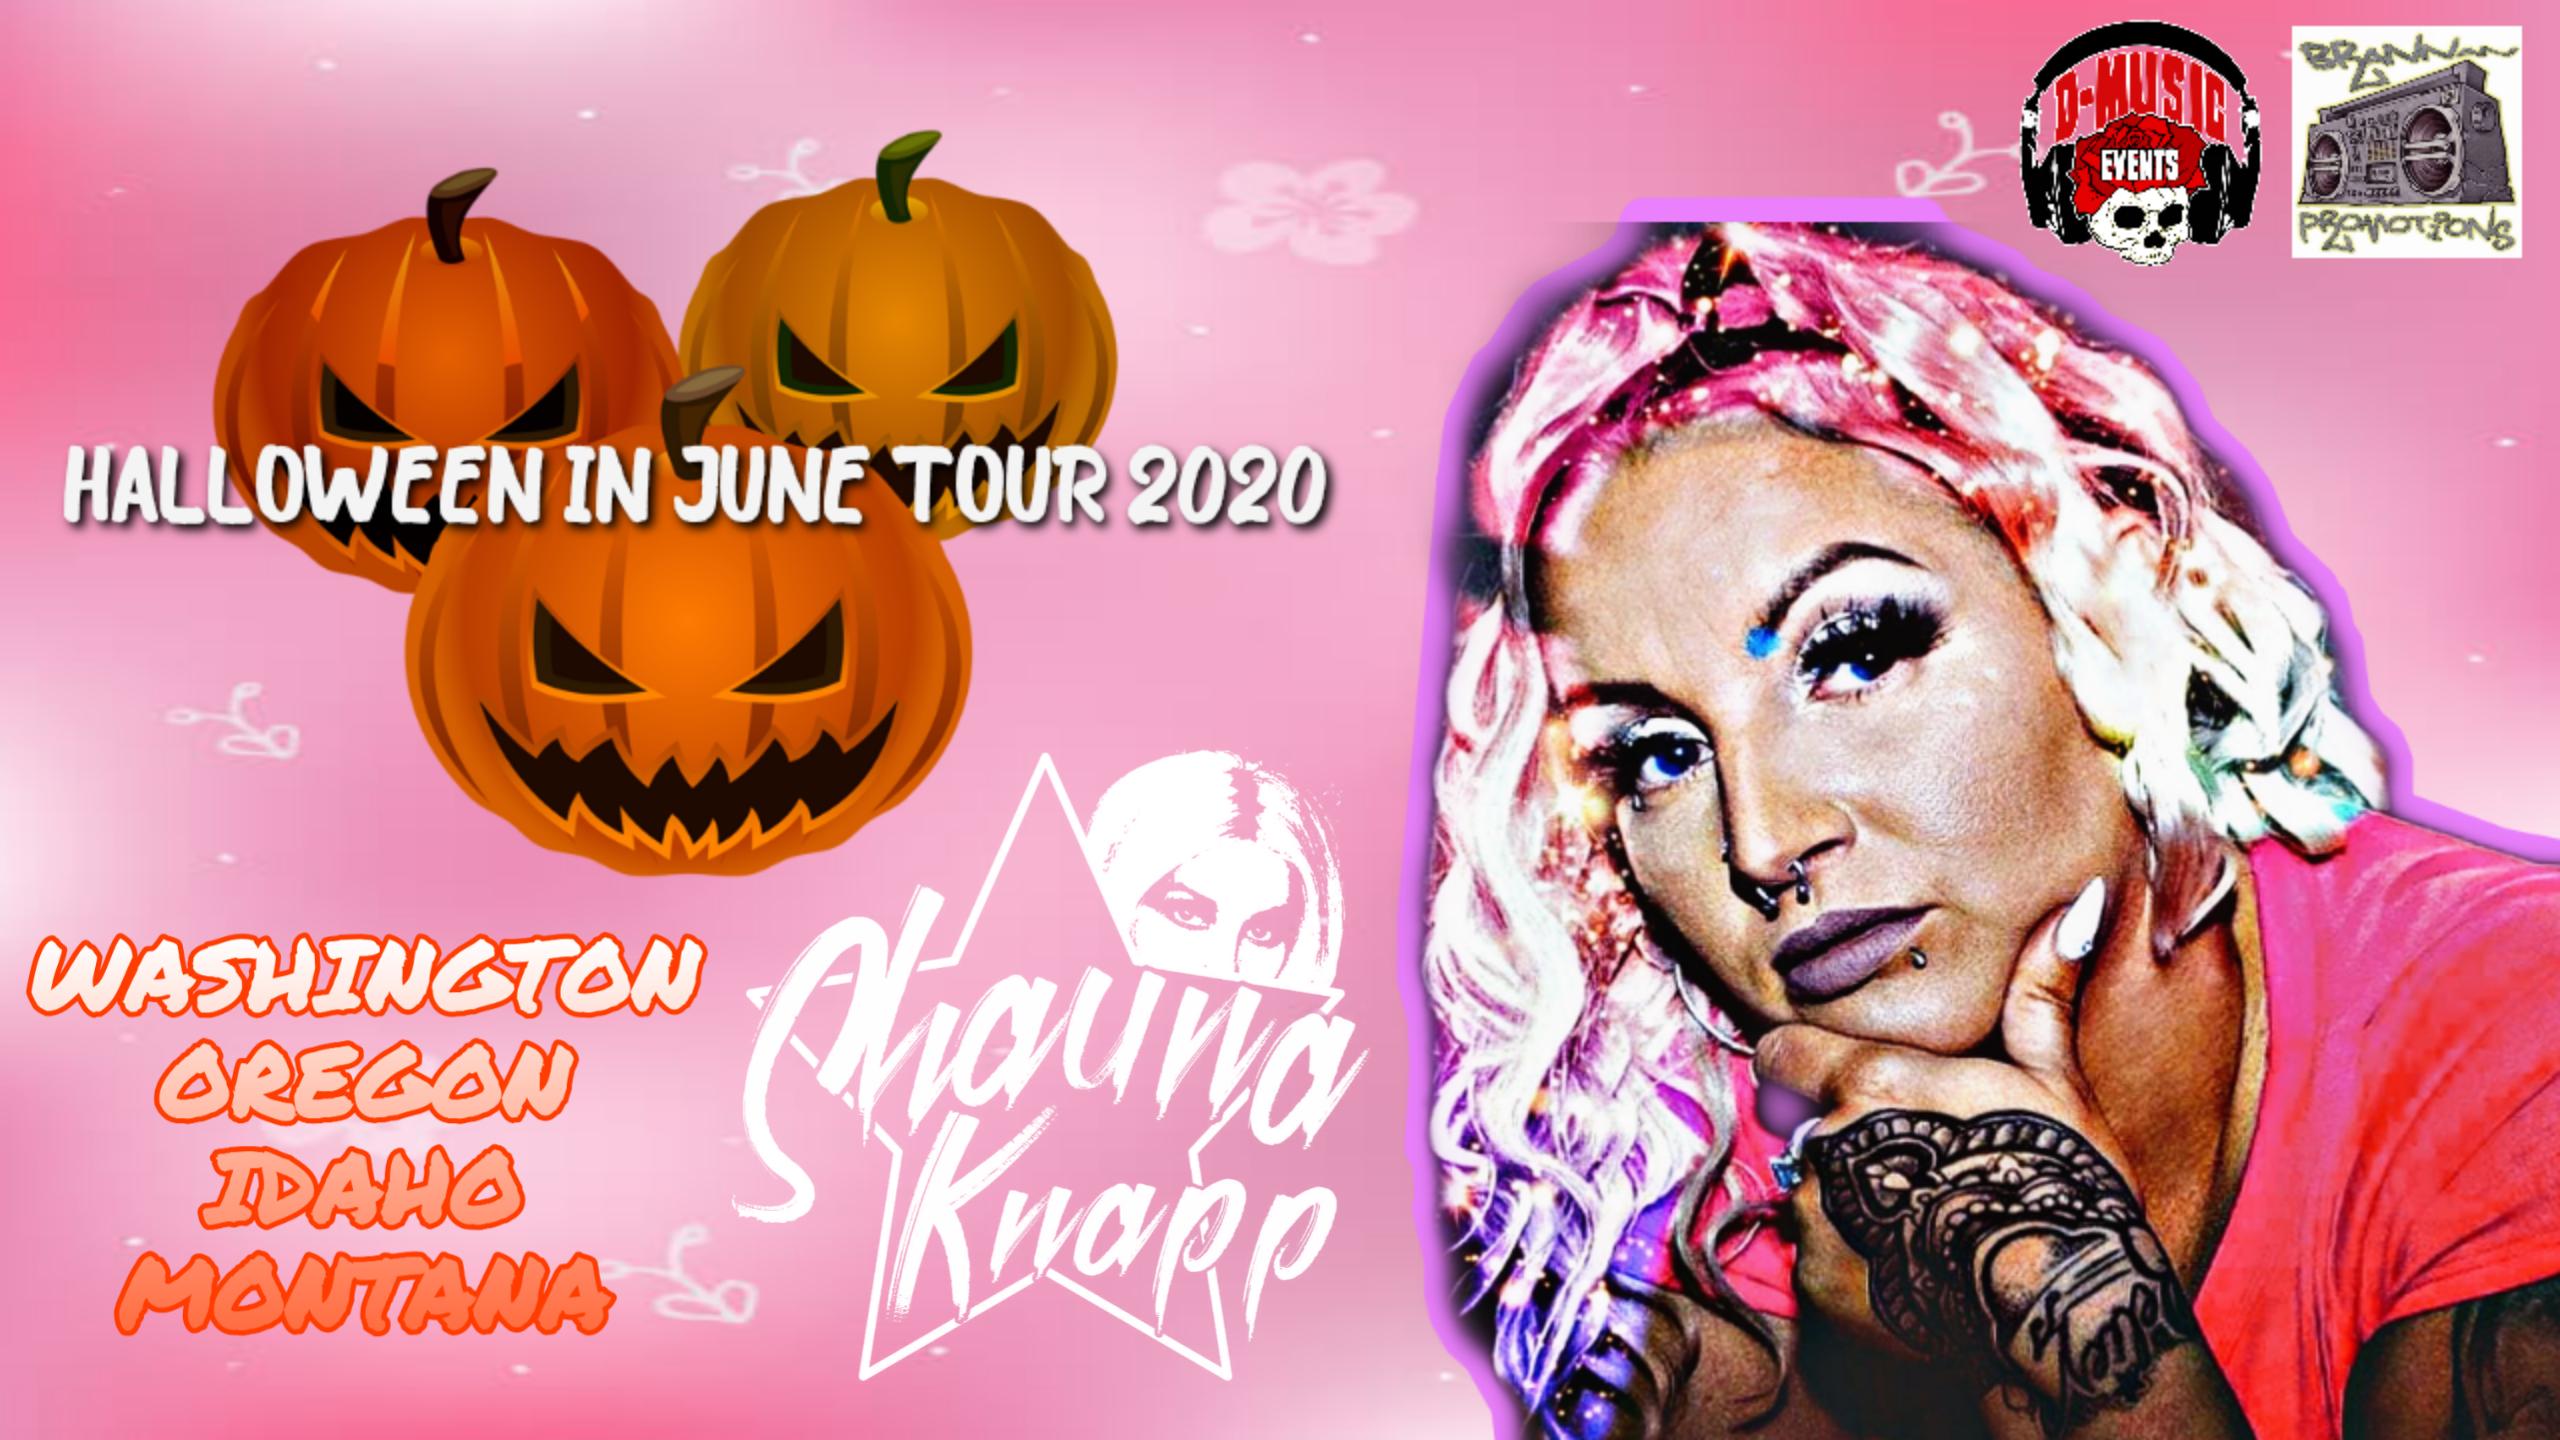 Eugene Halloween Events 2020 Shauna Knapp   City Nightclub   Eugene, OR   28 JUN 2020